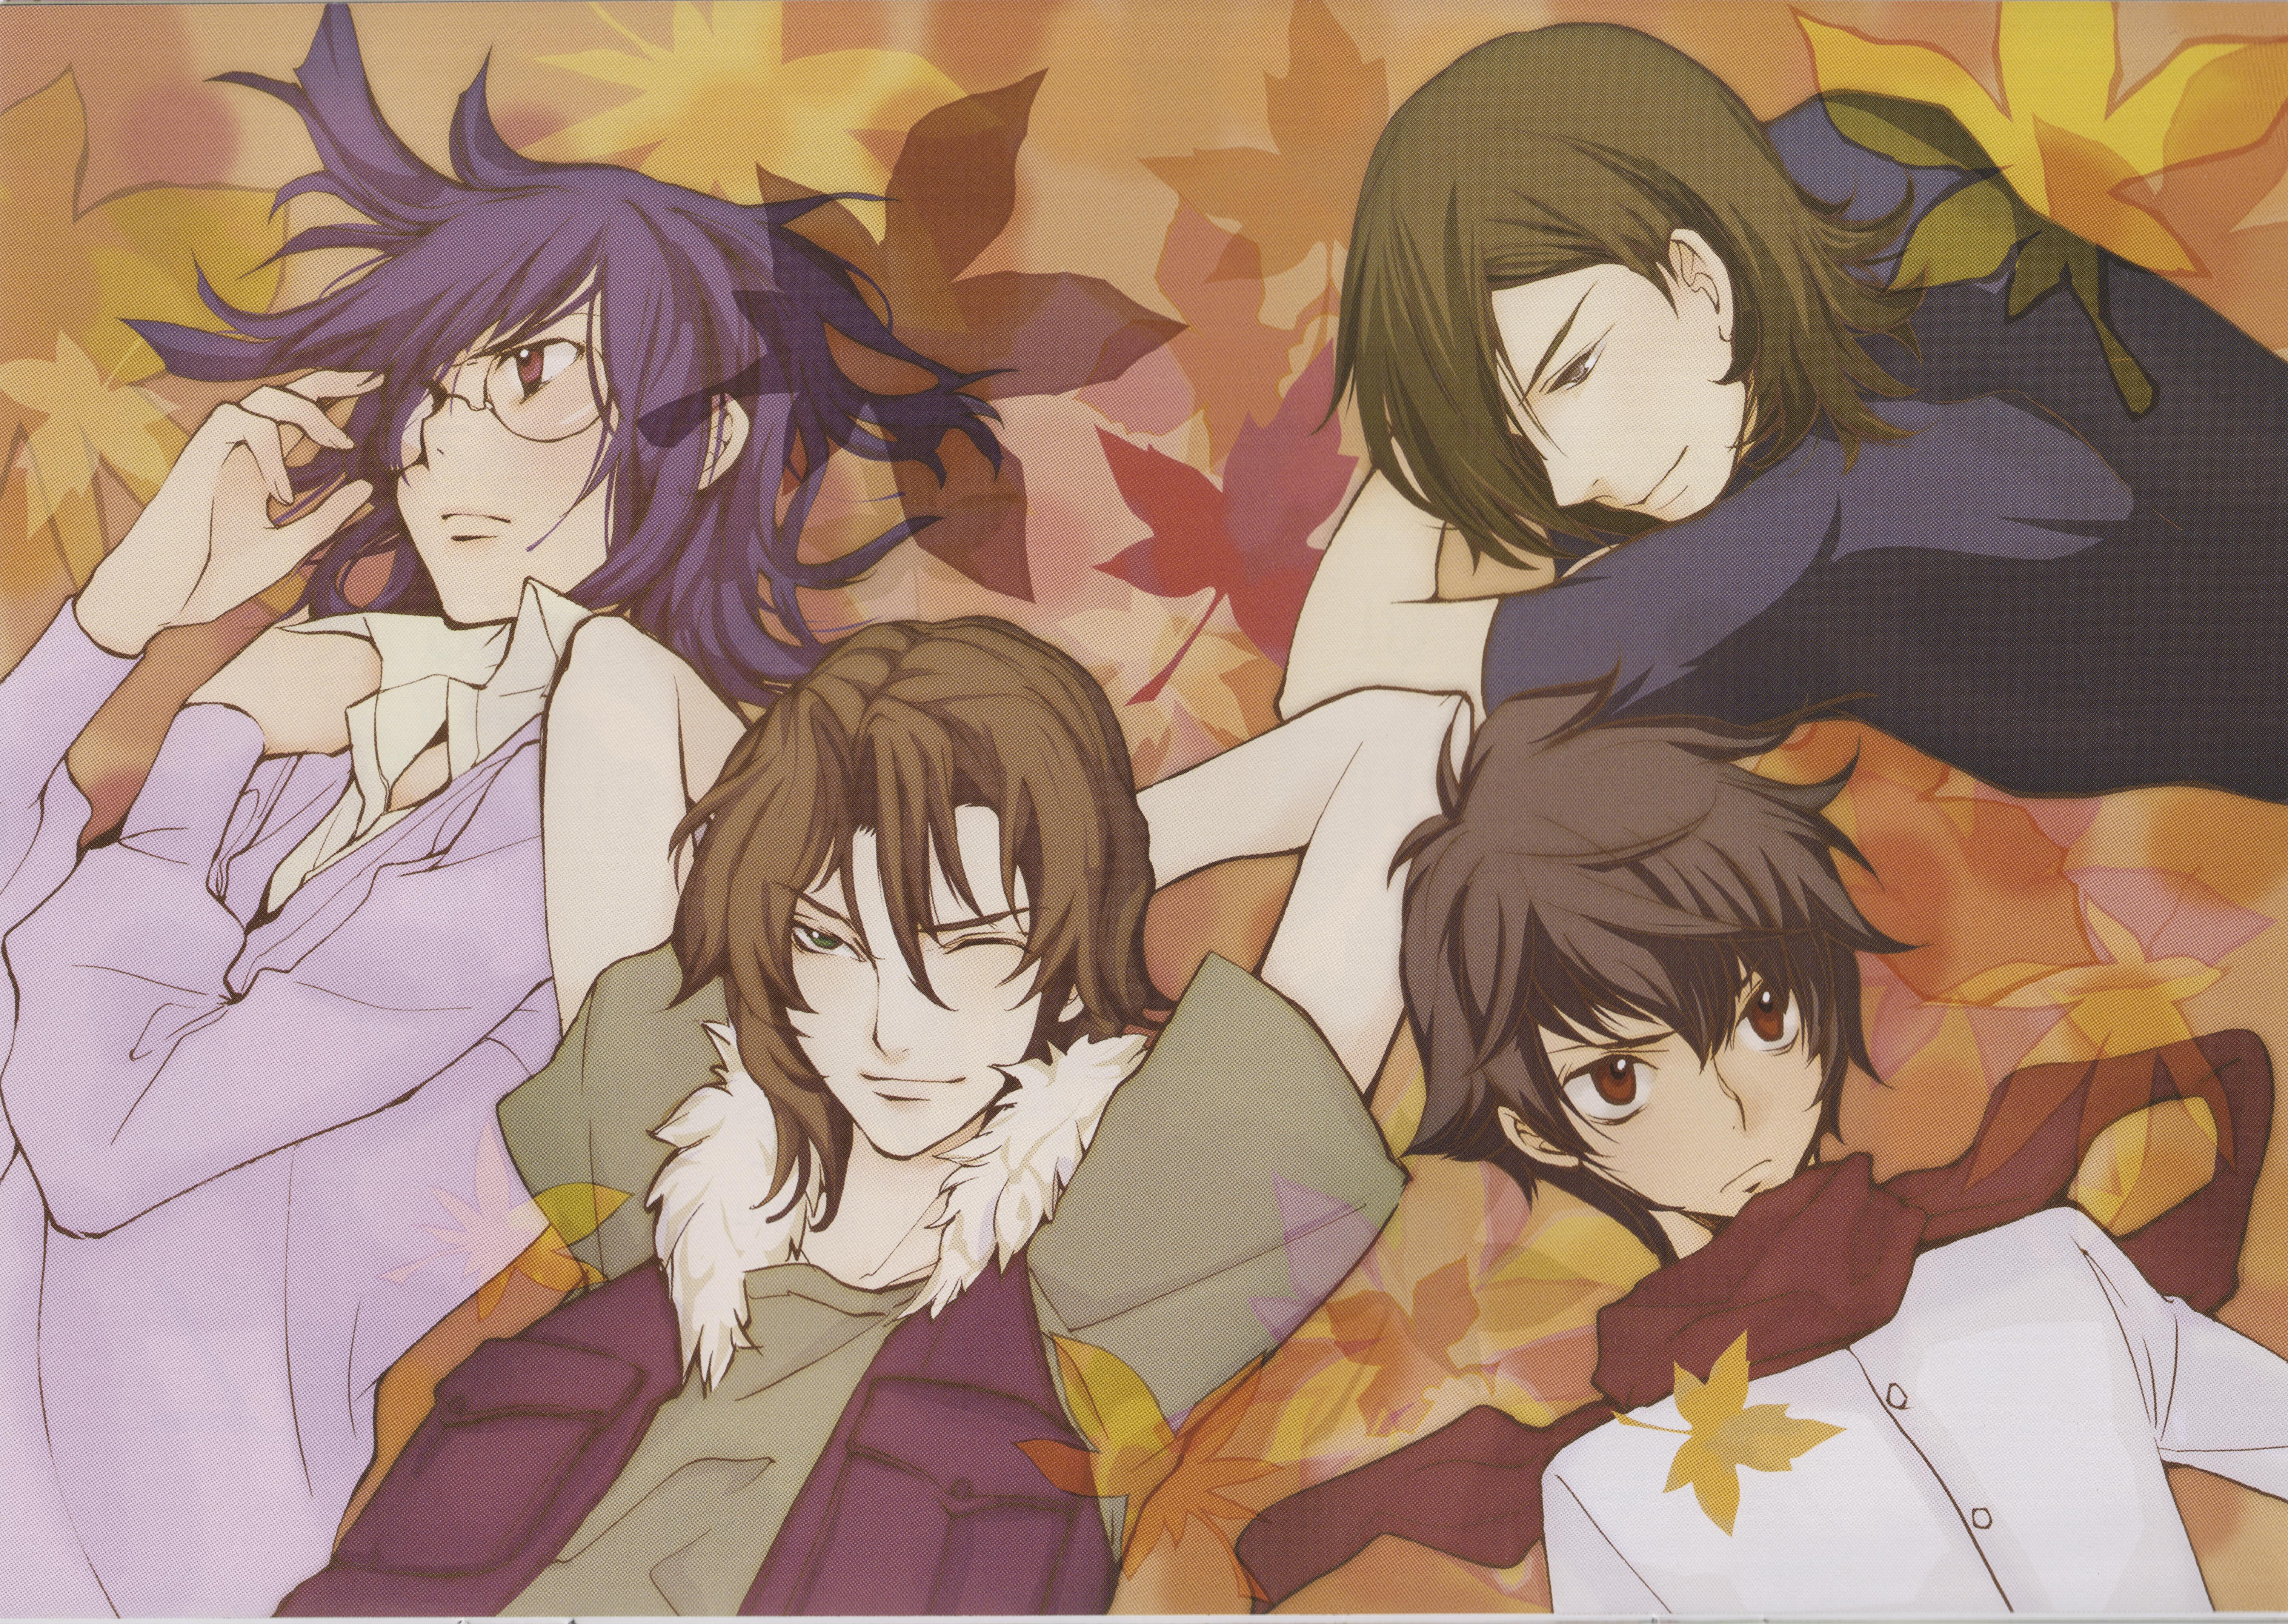 Mobile Suit Gundam 00 Wallpaper Zerochan Anime Image Board